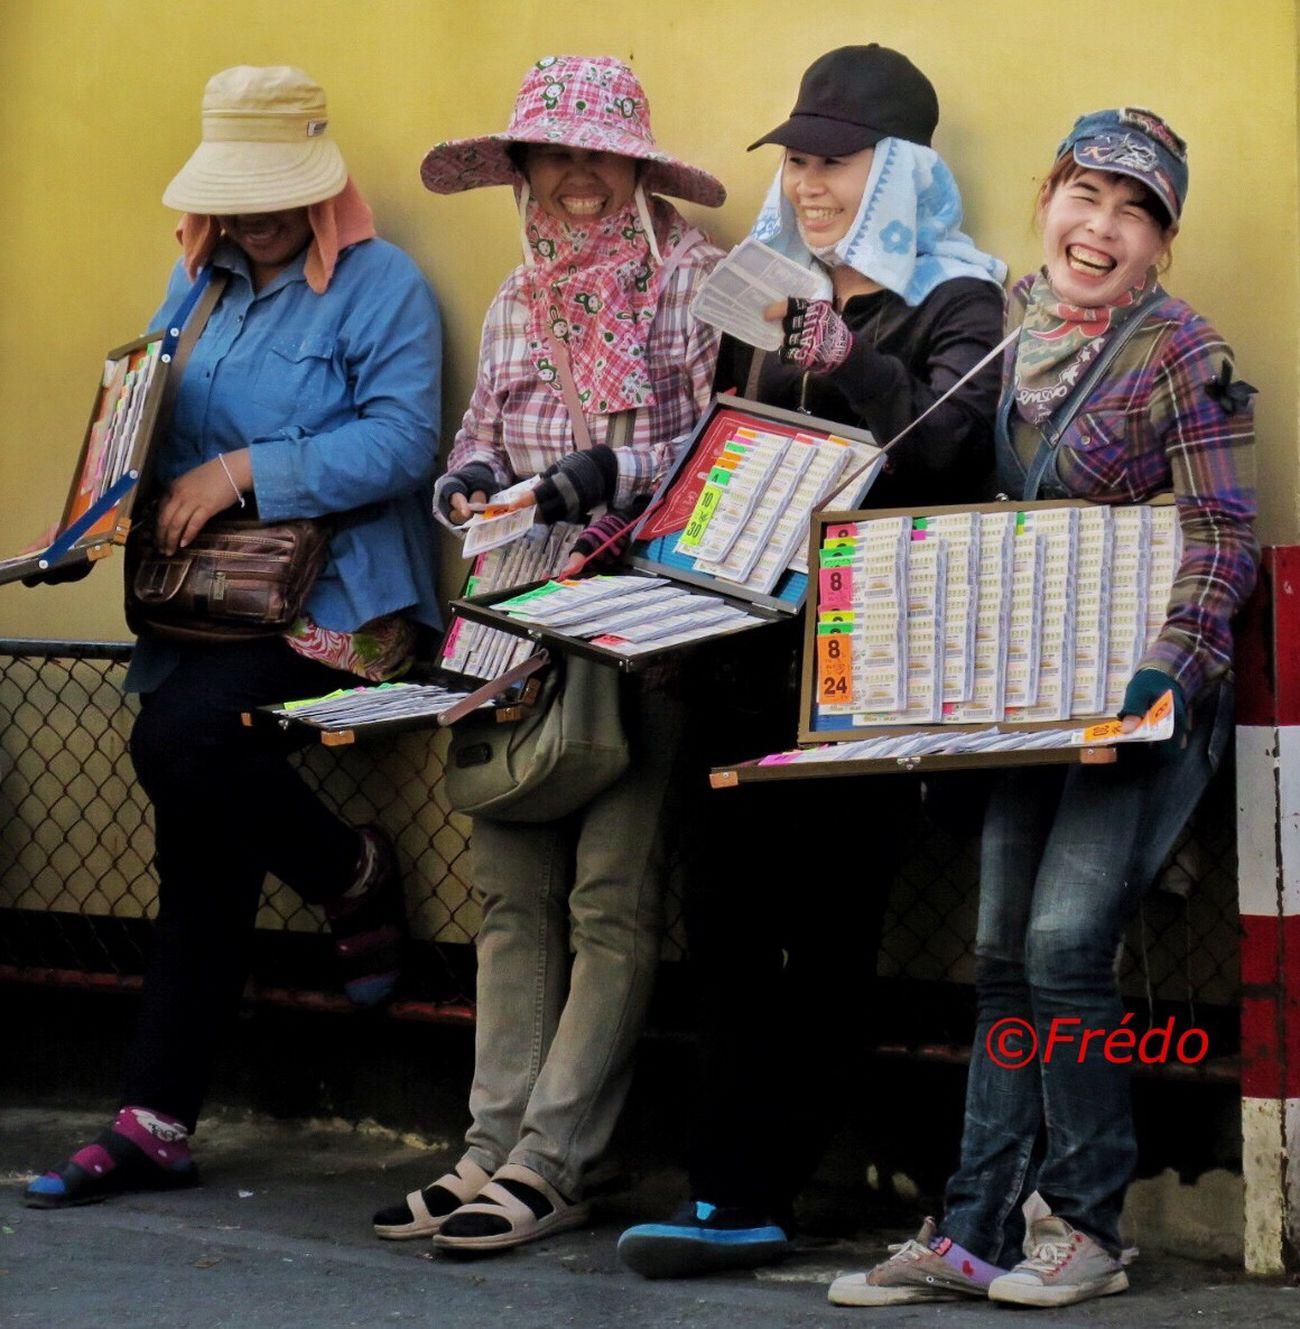 Happiness Thaïlande Streetphotography Portrait Real People Street Photography Eye4photography Colorful Photo Streetphoto EyeEm Gallery Smile Happiness Thaistagram Eyem Best Shots Street Photos😄📷🏫⛪🚒🚐🚲⚠ EyeEm Best Edits EyeEm Best Shots EyeEmBestPics Thailand Photos Thailand_allshots Streetphoto_color Eyeemphotography Photooftheday #Chiang Mai Eyem Gallery Lottery #joy